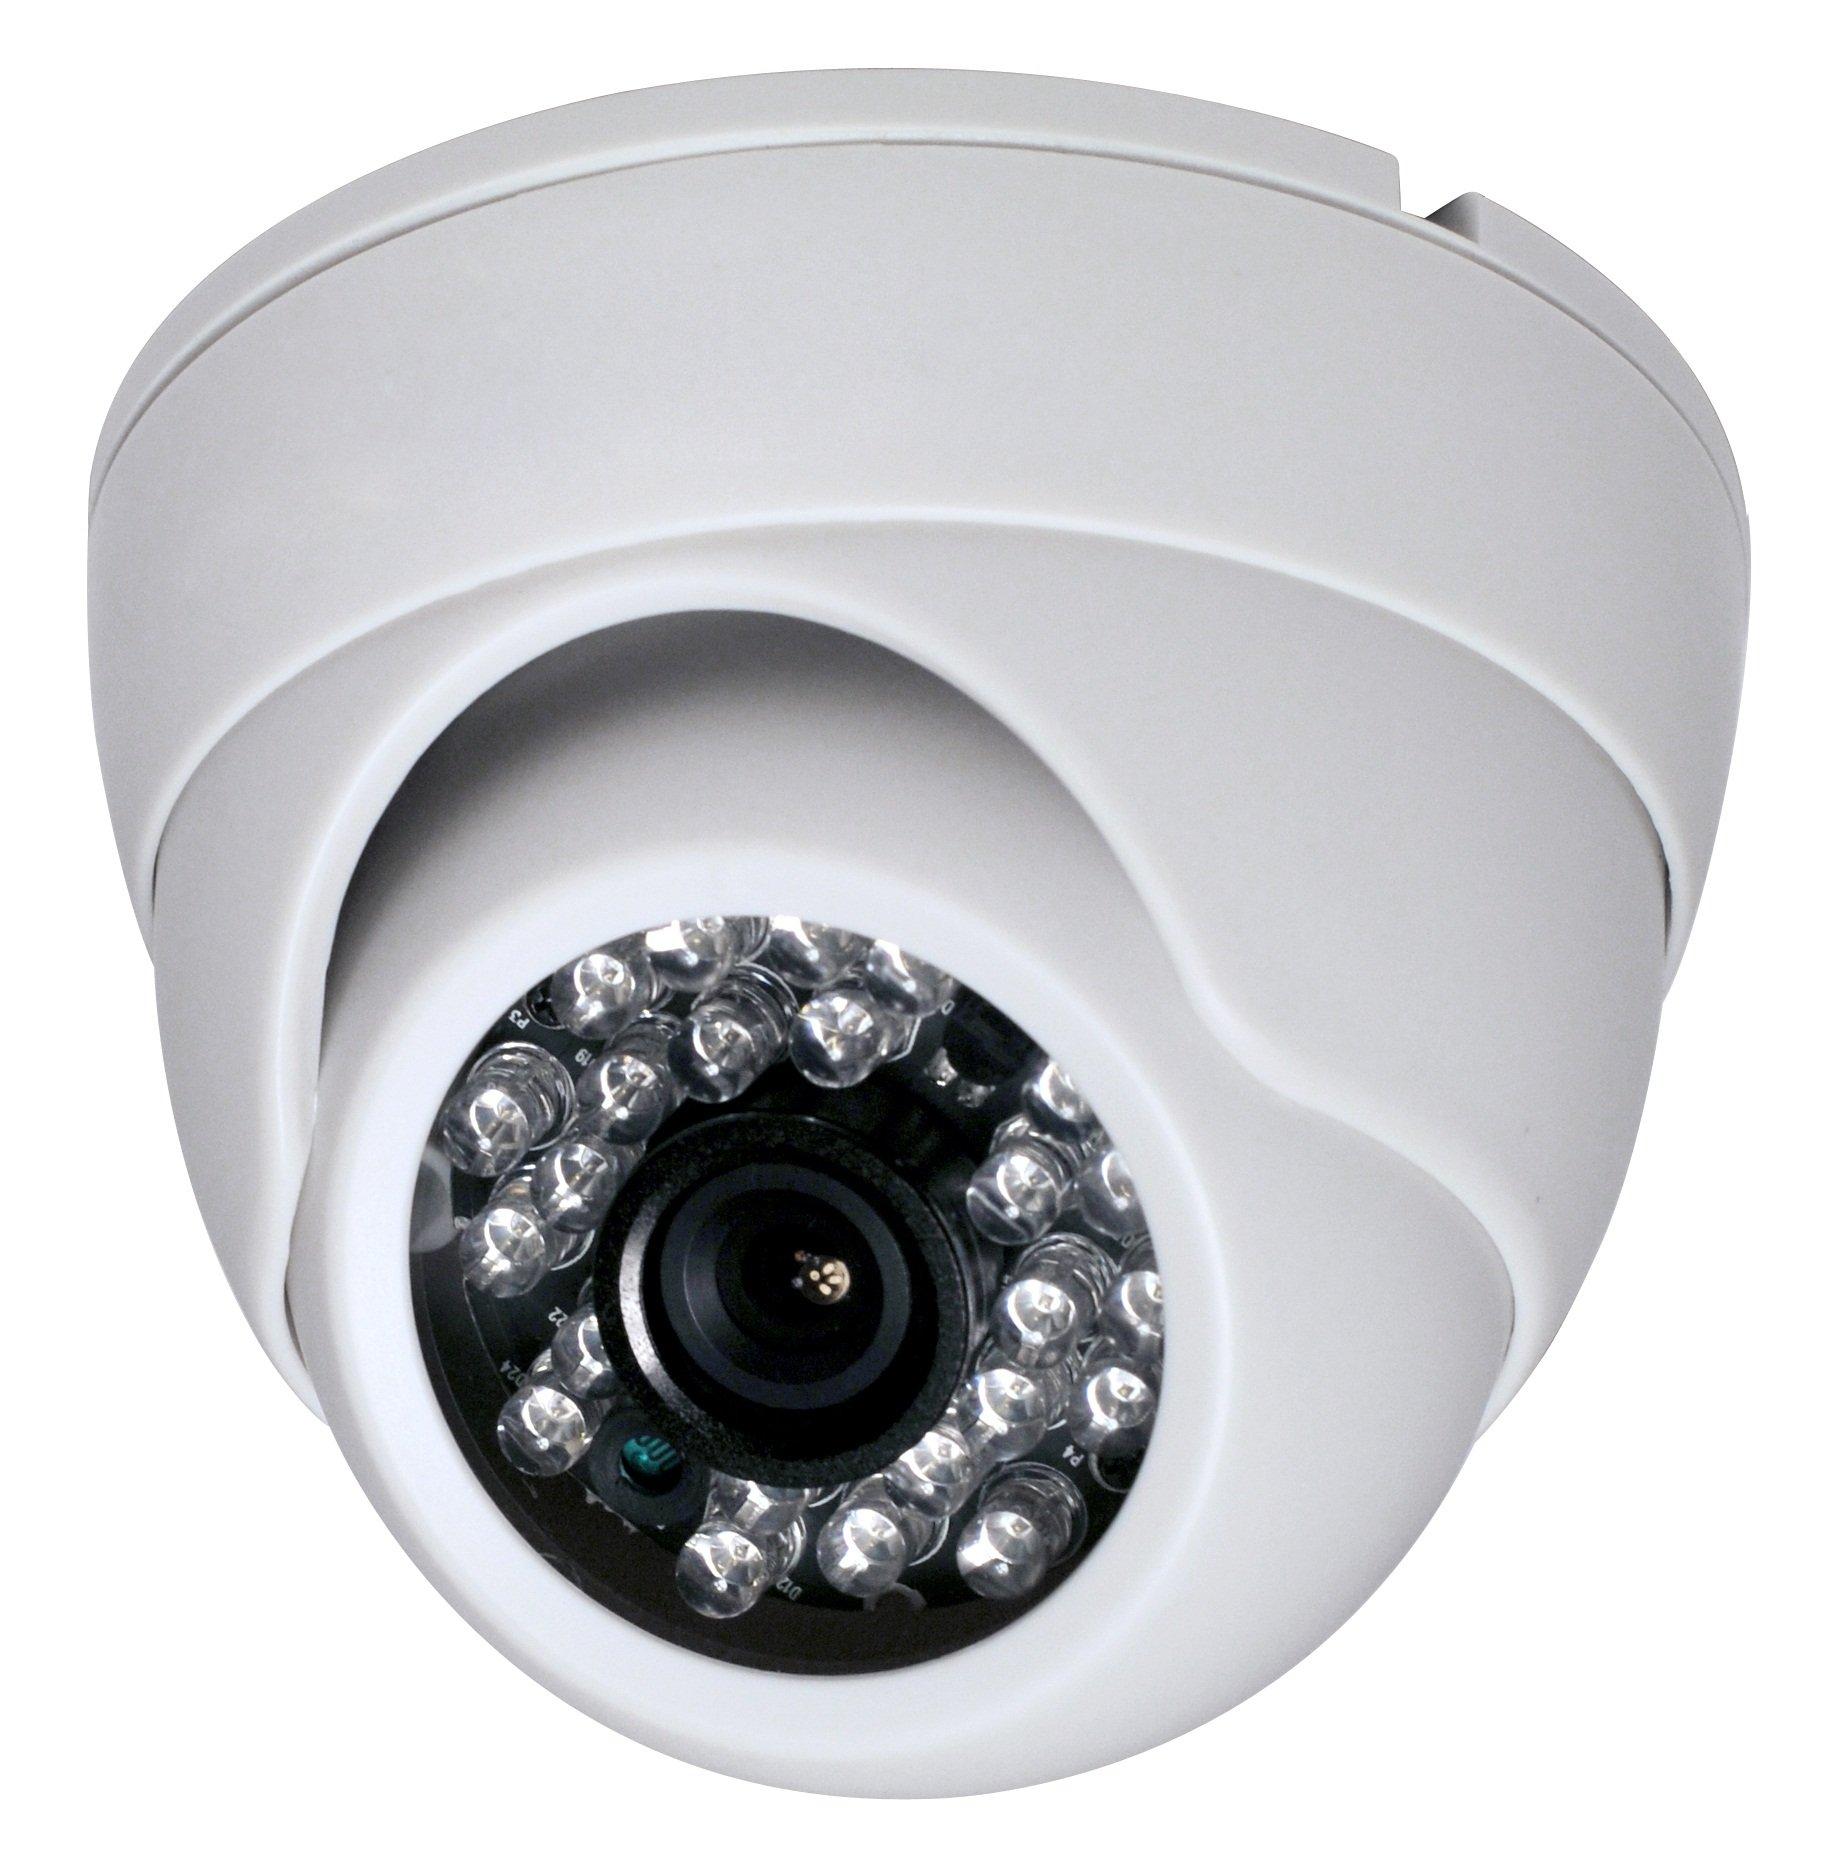 2 Megapixel 1080P Dome IR HD-CVI HD-TVI AHD CVBS 700TVL (4 options in 1) Camera 24IR 3.6mm lens Vandalproof Small Indoor Outdoor Aluminum Housing Security Camera for White Color